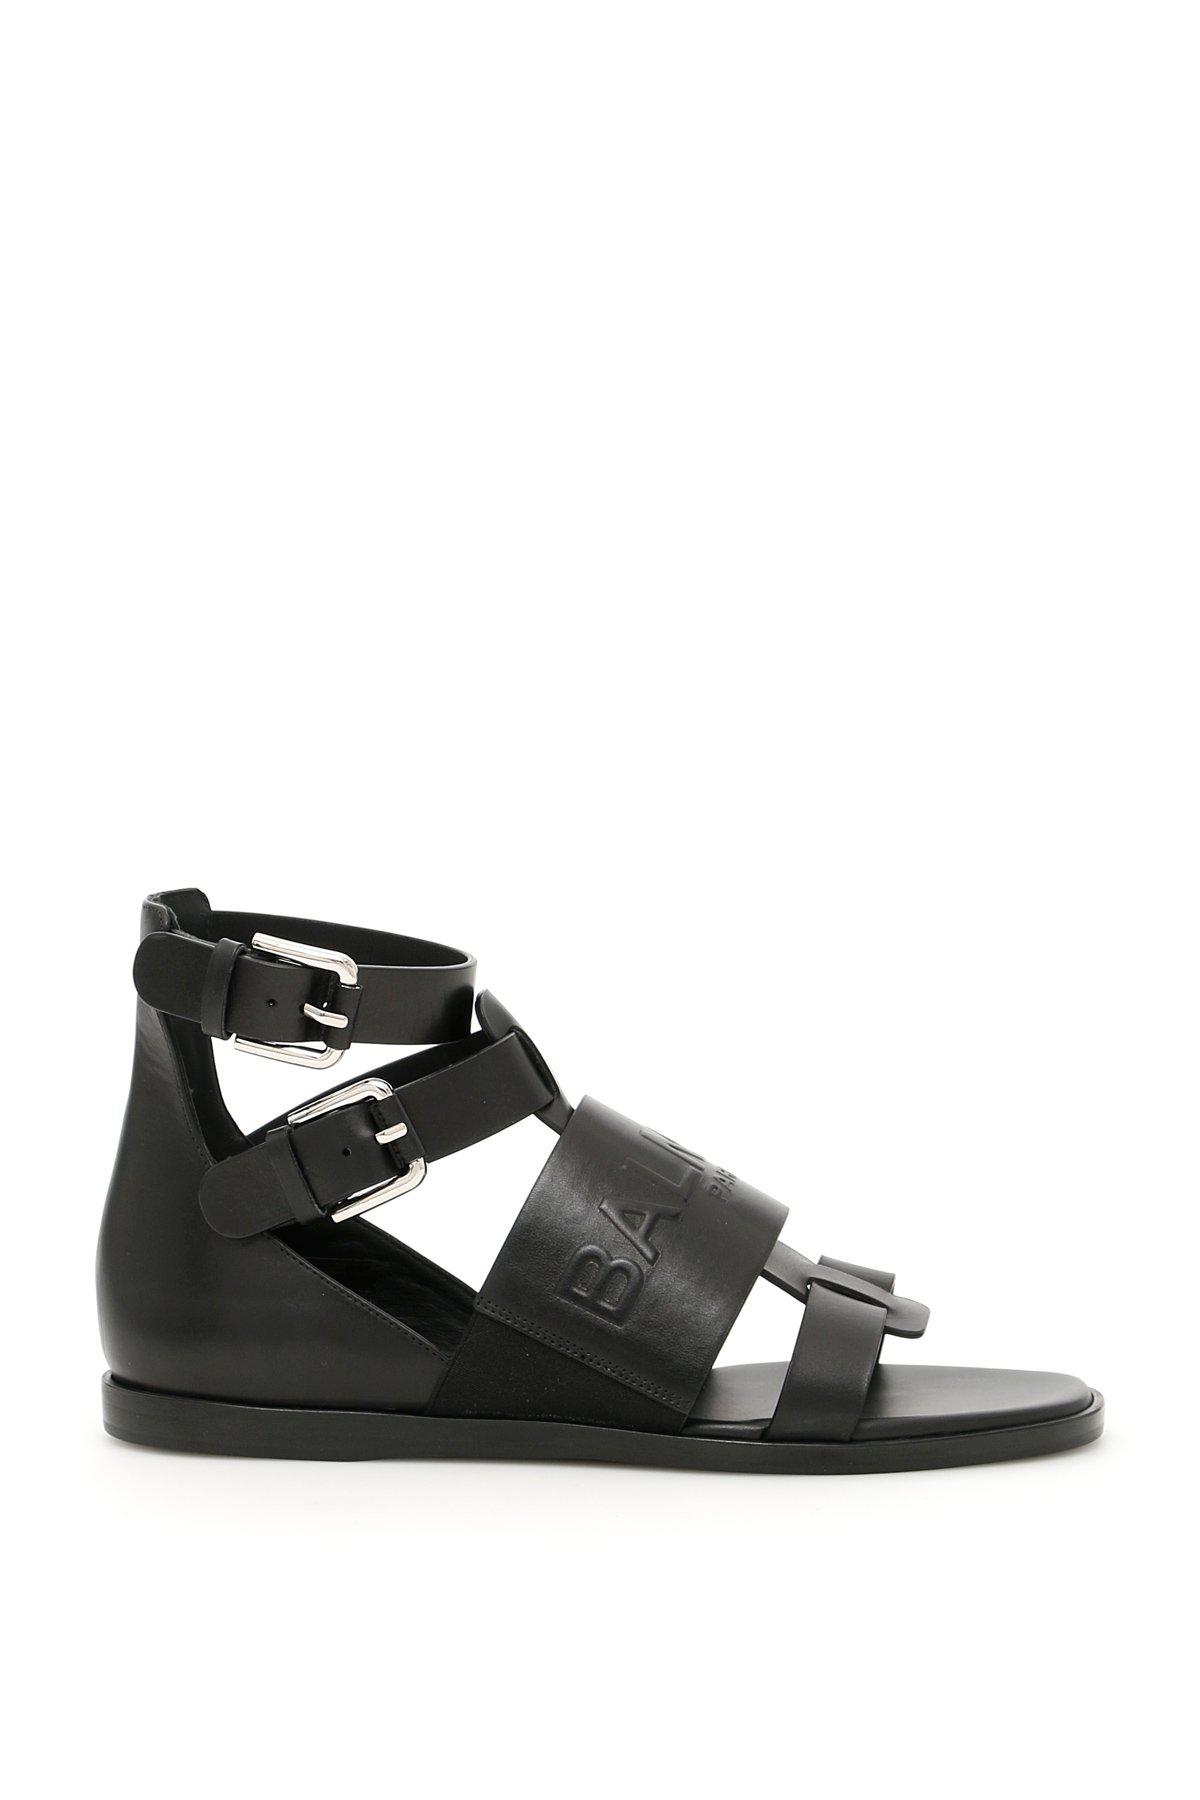 Sandales En Cuir Gaufré Logo-noir - Balmain htvmeKyC